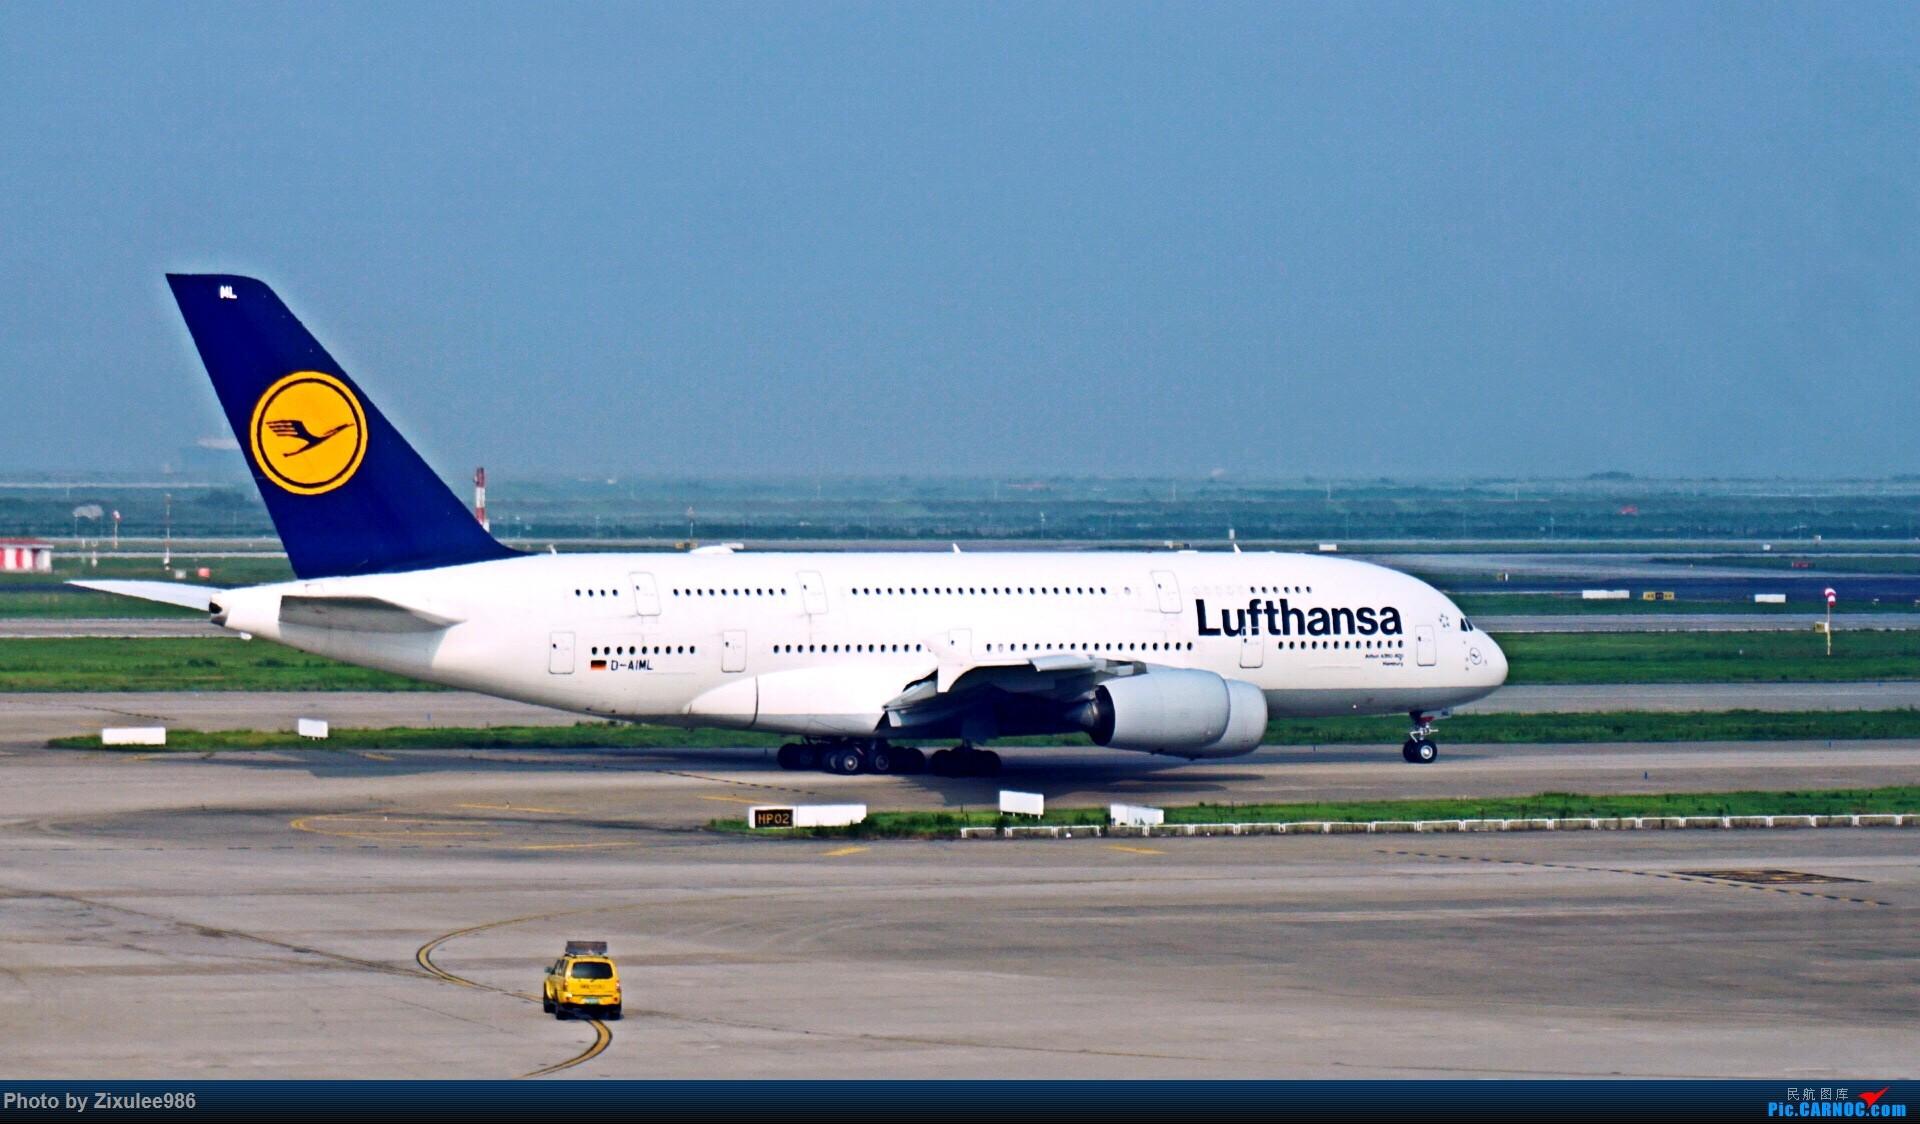 Re:[原创]加拿大21日游学之旅(一)~JJN-PVG-YYZ..(内含flightlog)~第一次发游记~多图缓更请谅解 AIRBUS A380-800 D-AIML 中国上海浦东国际机场